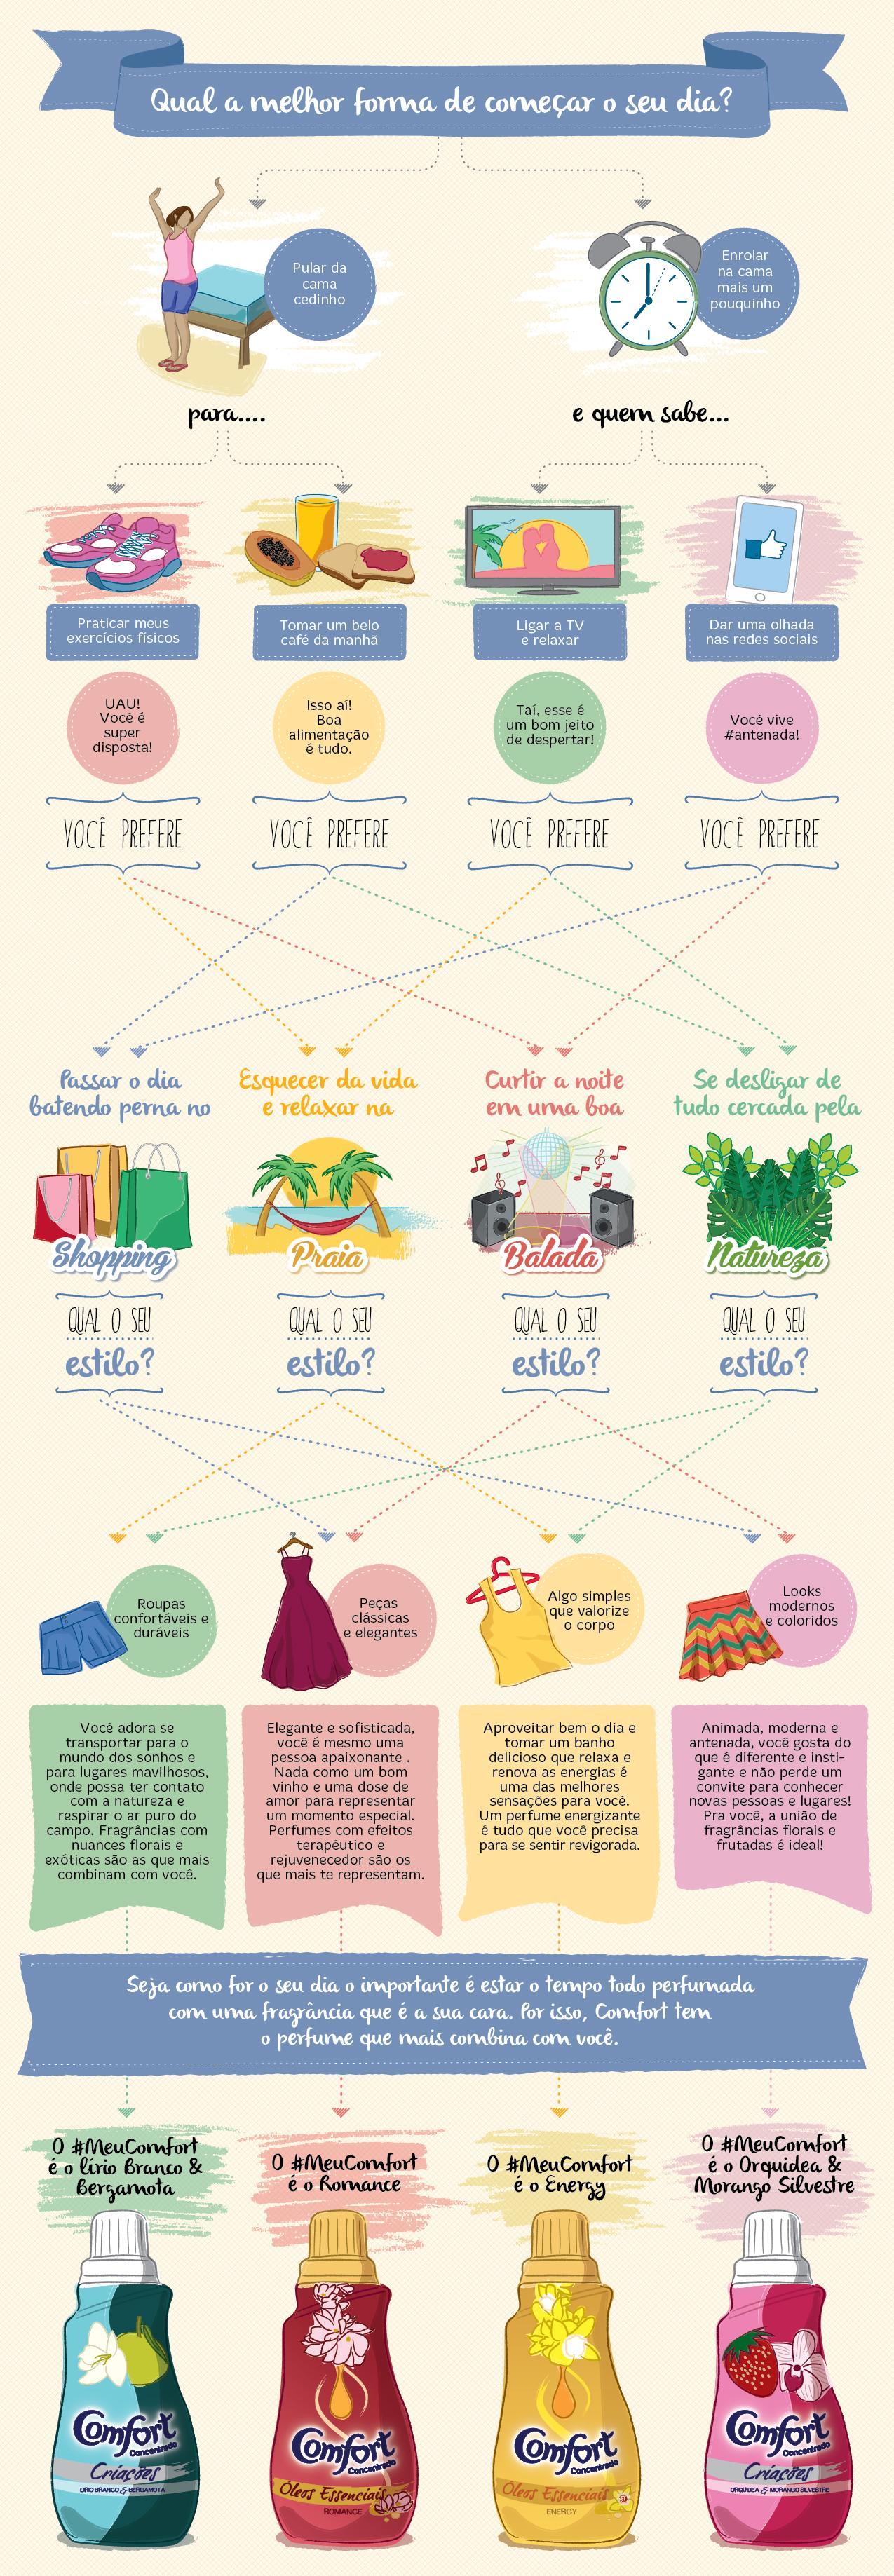 Infográfico Comfort  30-06-2015 VF